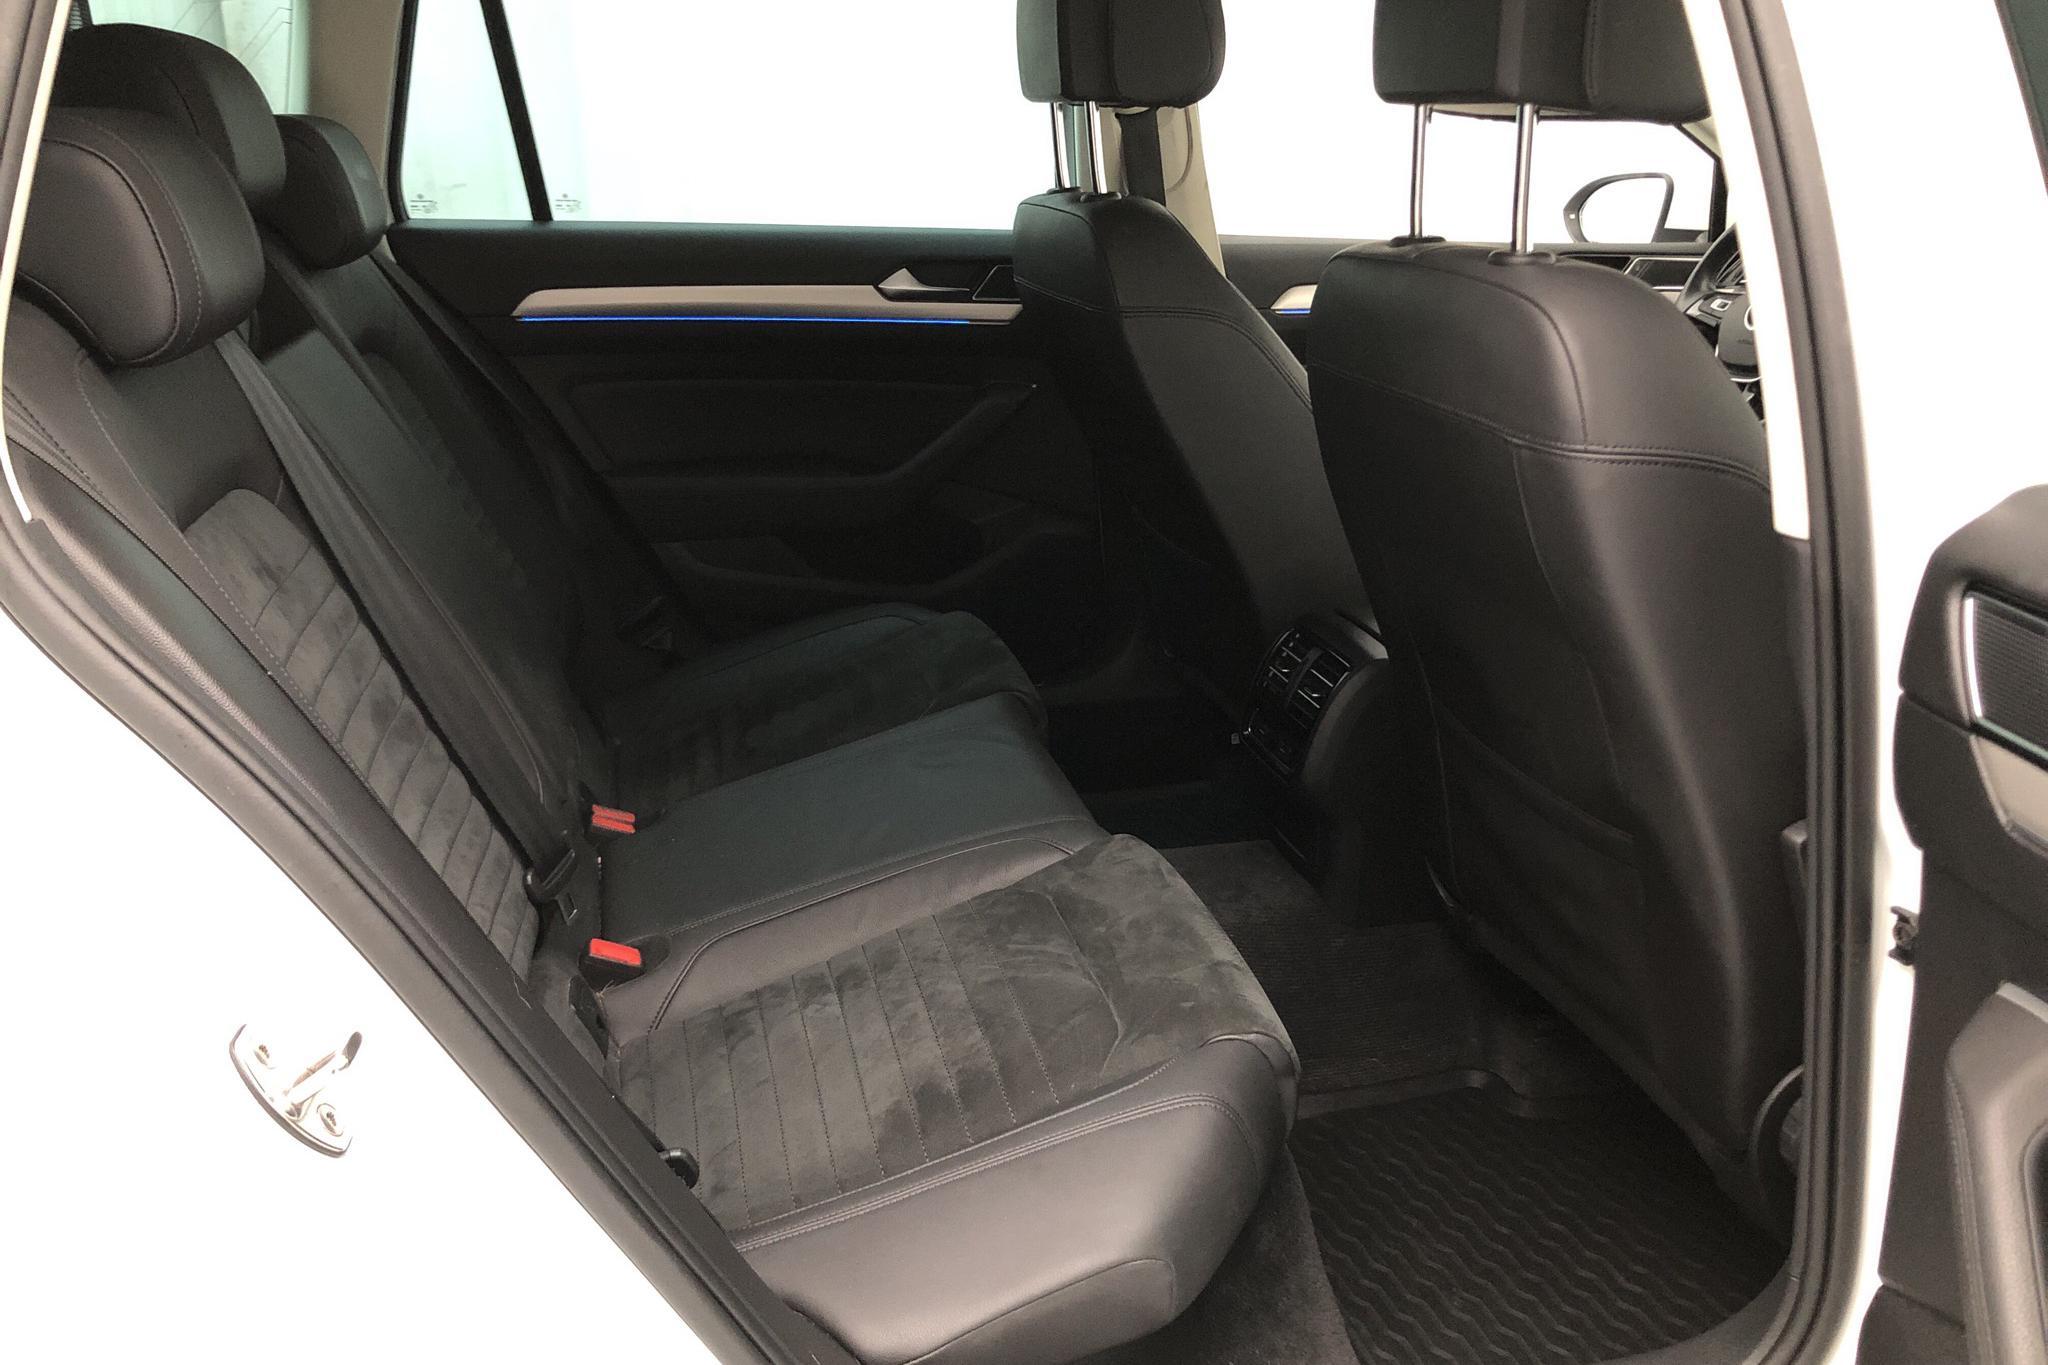 VW Passat 1.4 Plug-in-Hybrid Sportscombi (218hk) - 11 247 mil - Automat - vit - 2017